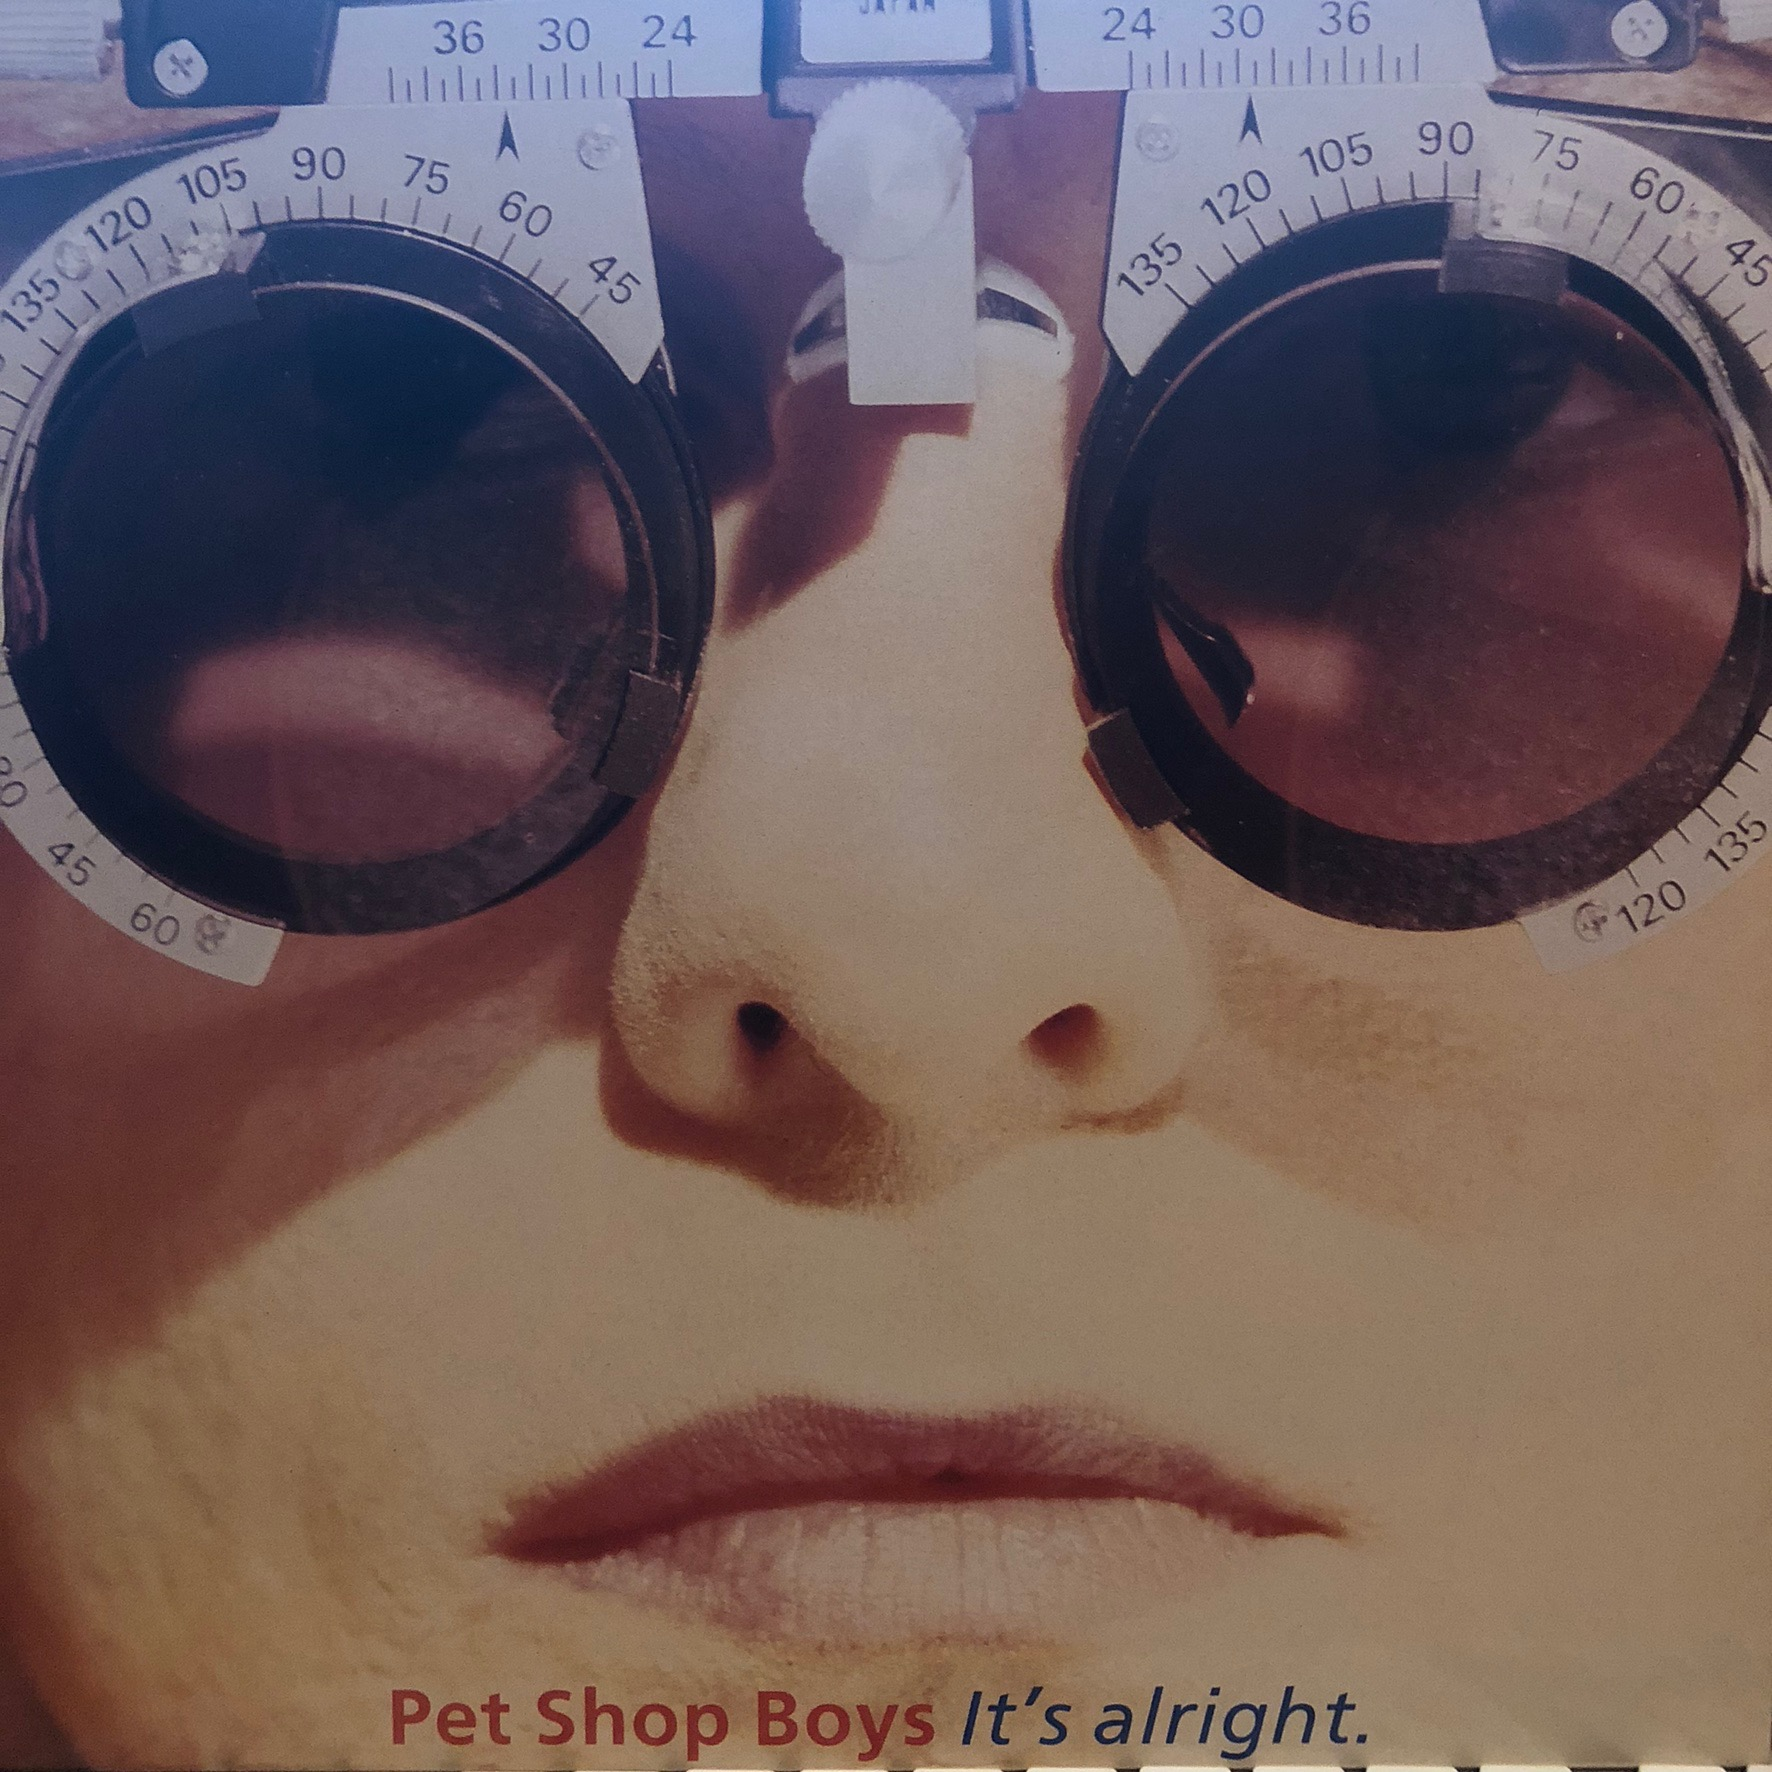 Pet Shop Boys - It's alright - Front Cover